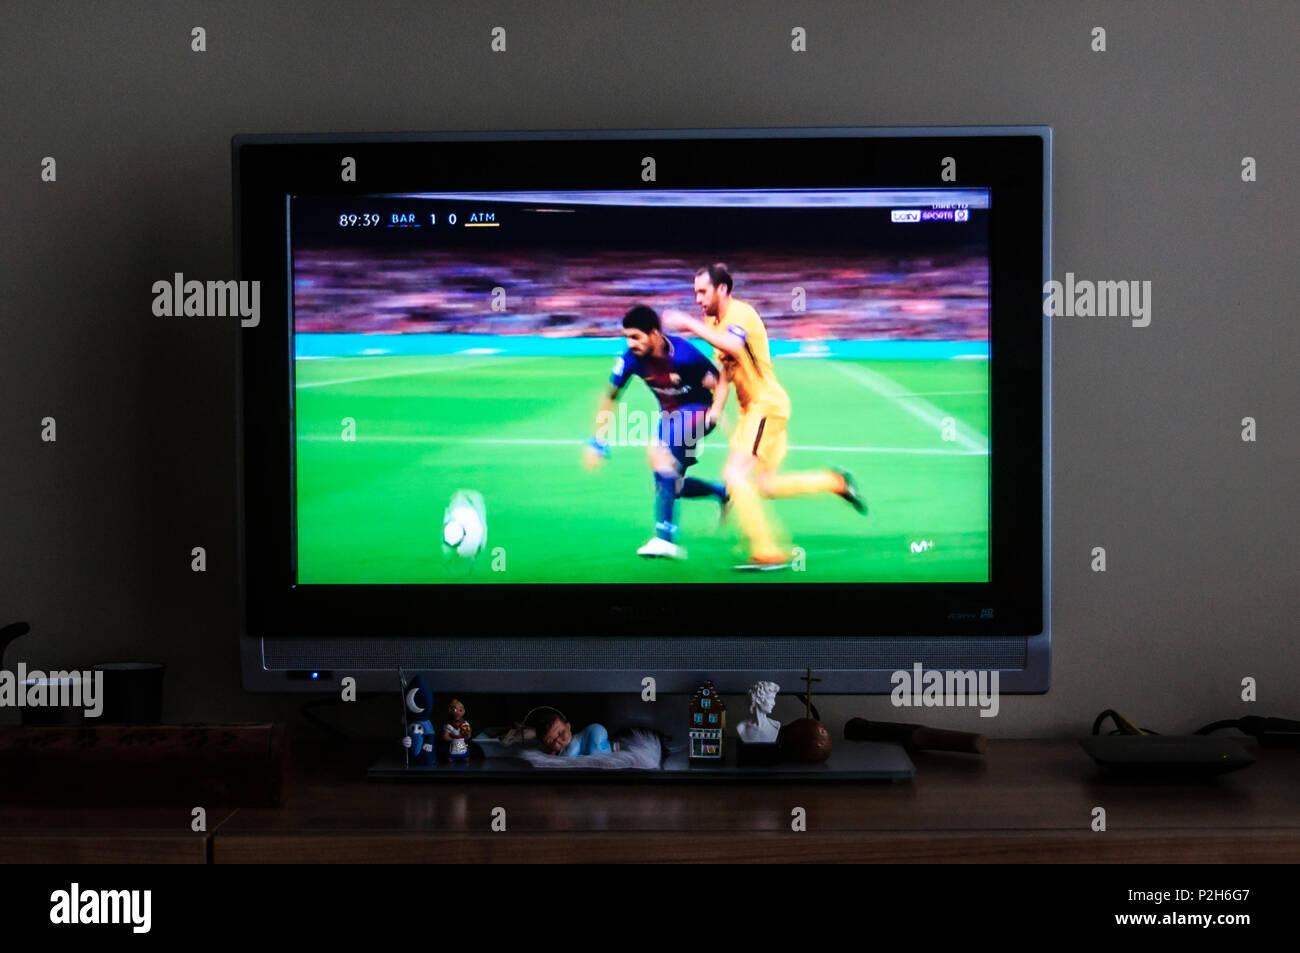 Suarez on tv football macht - Stock Image